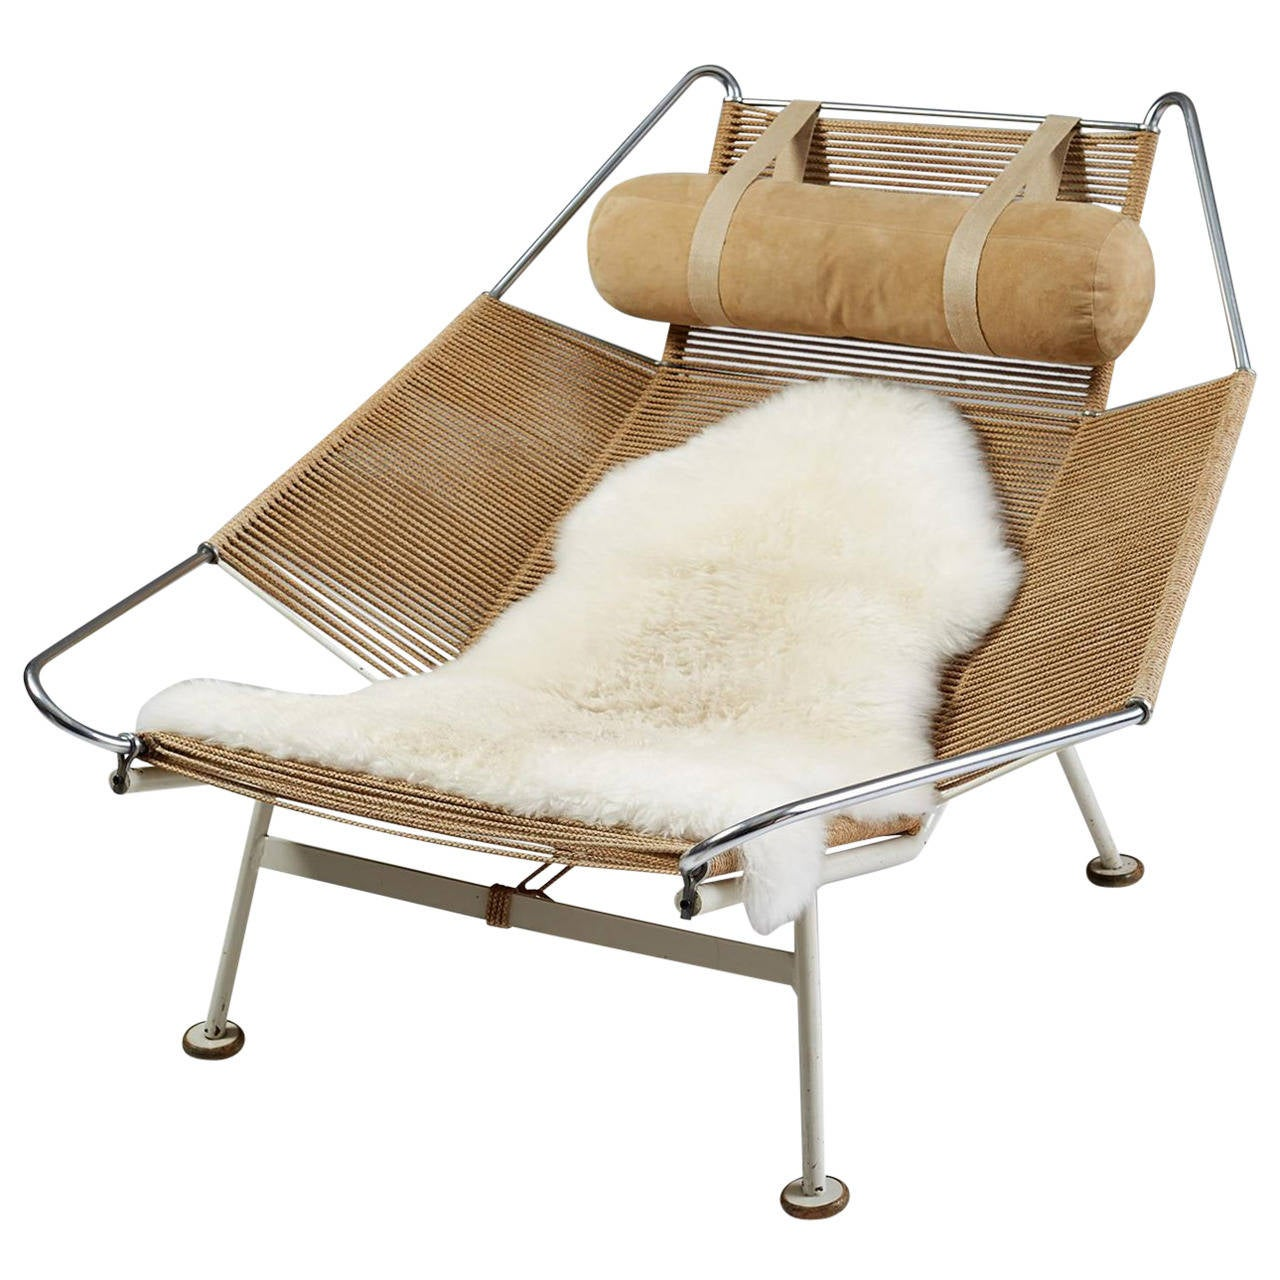 Flag Halyard Chair Designed by Hans Wegner for Getama